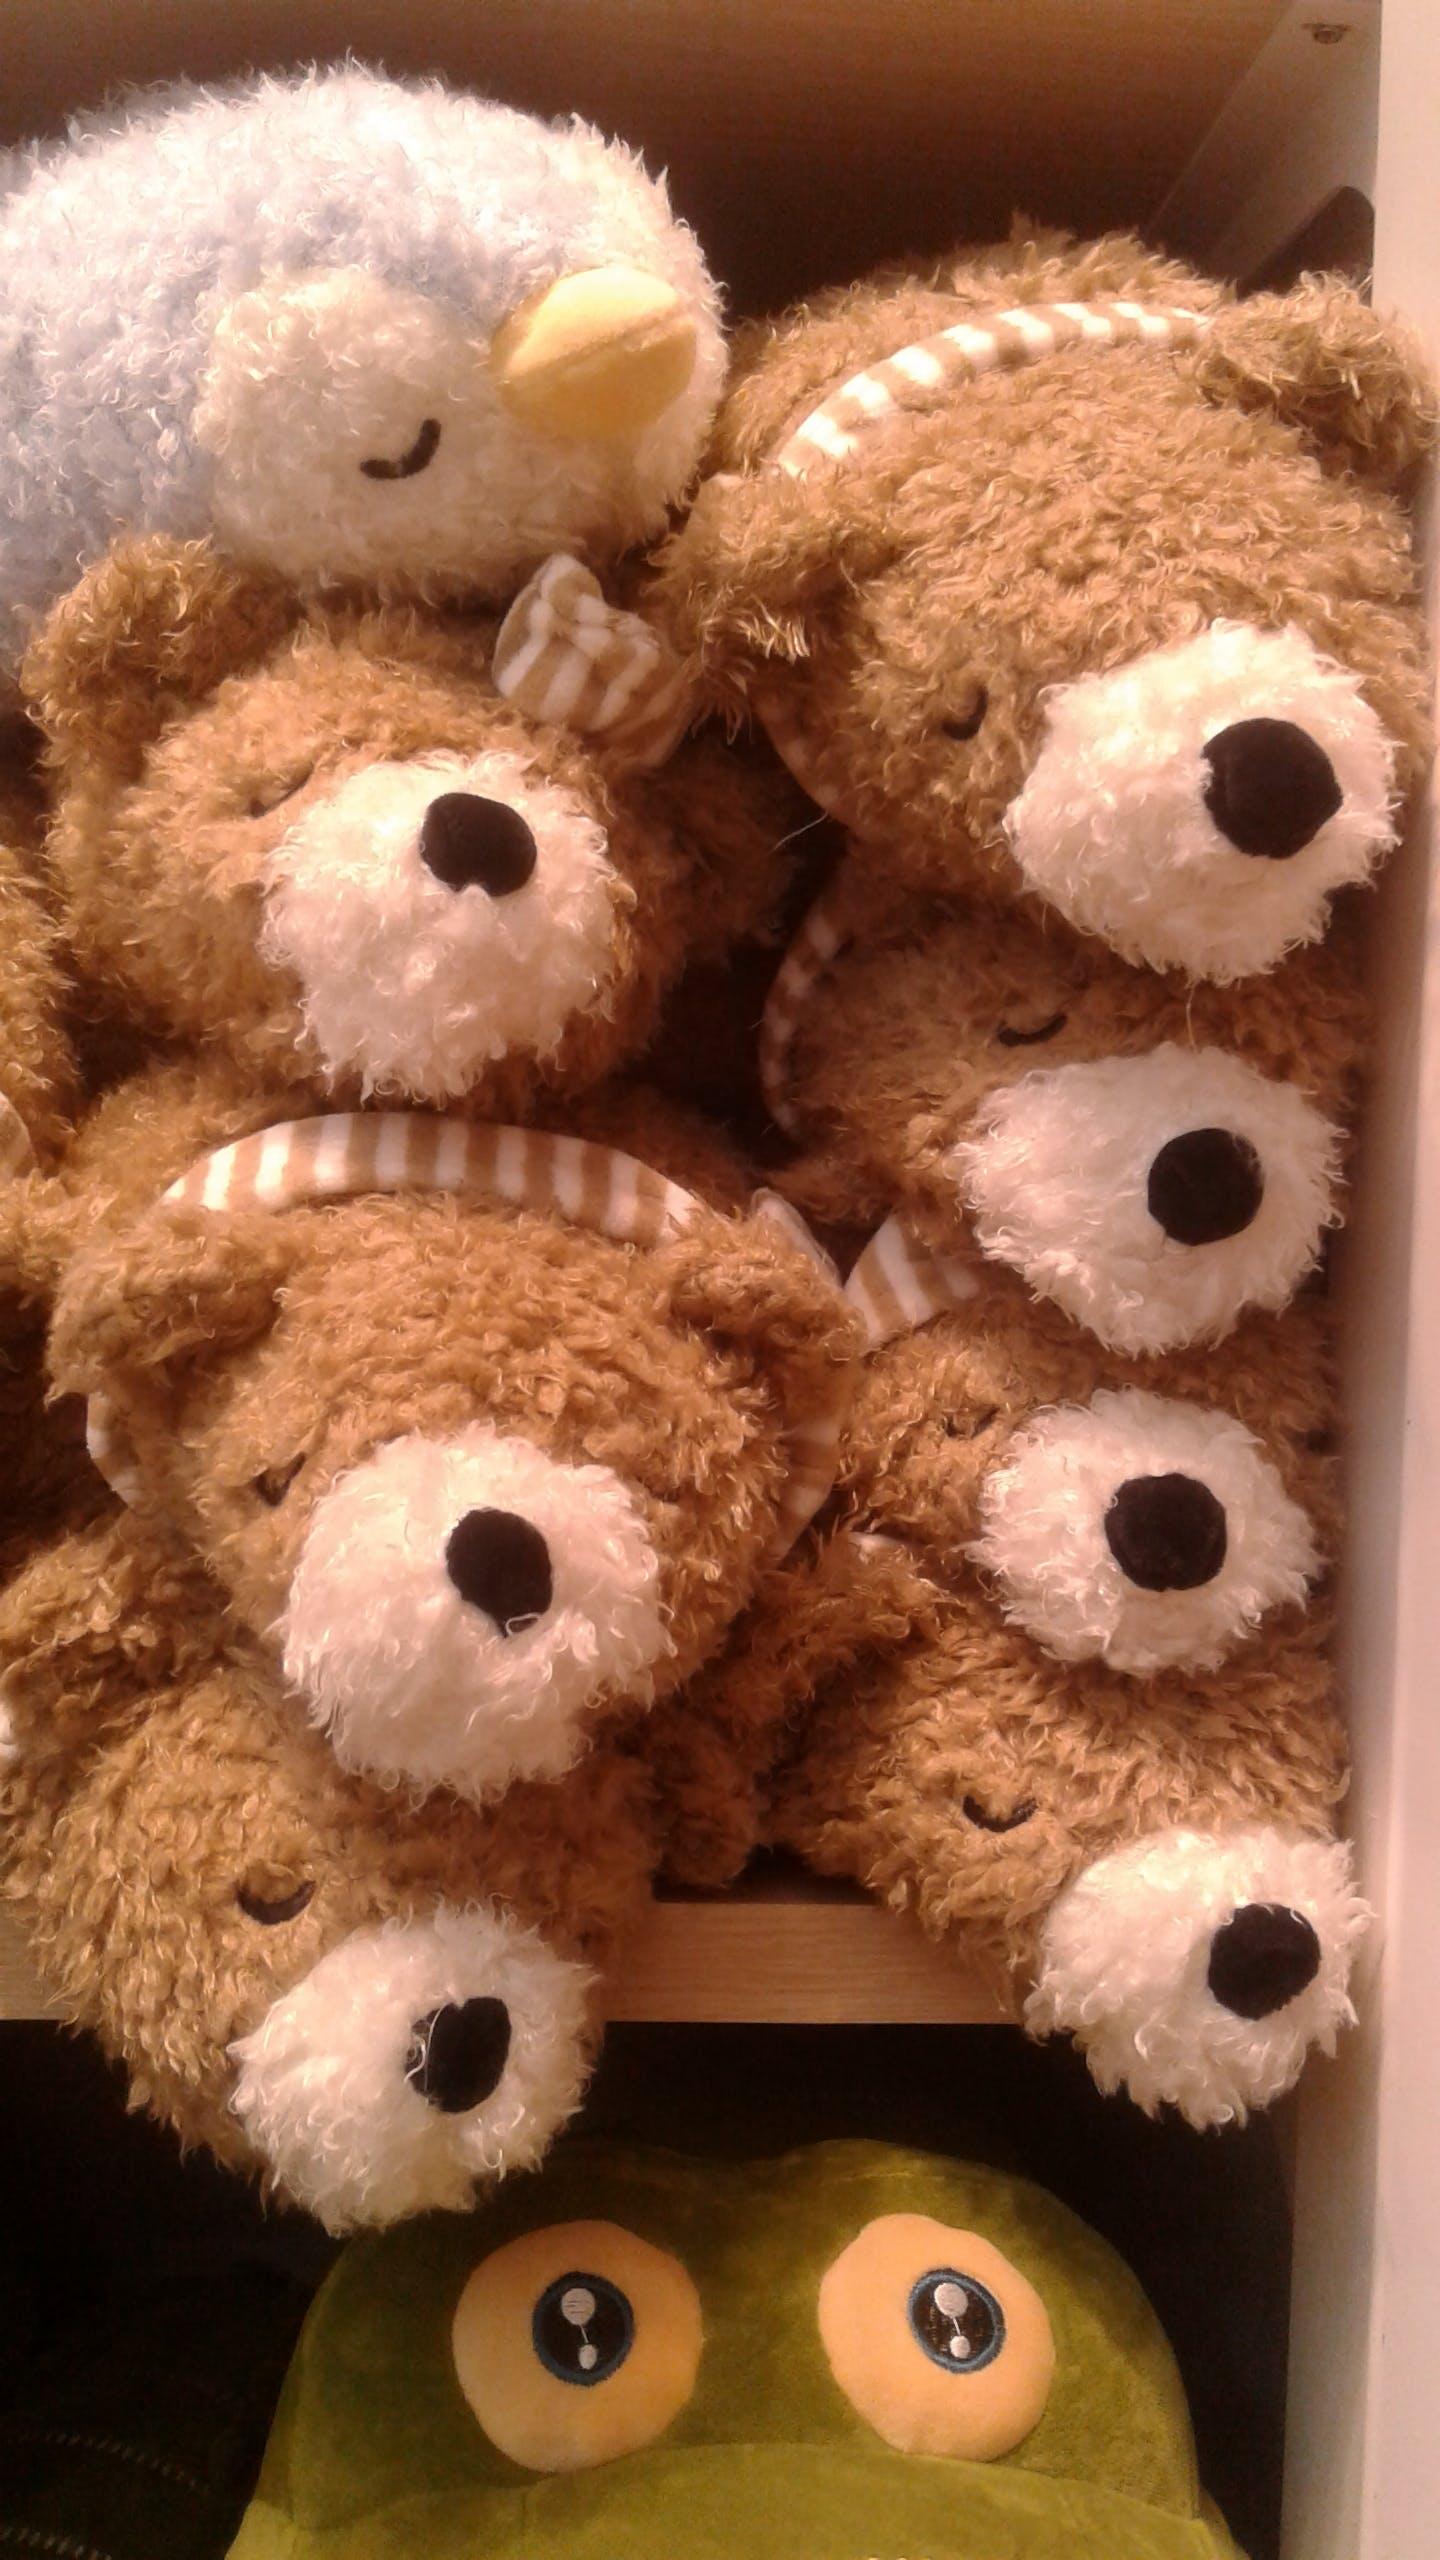 Free stock photo of bear, bird, Crocodile, dolls